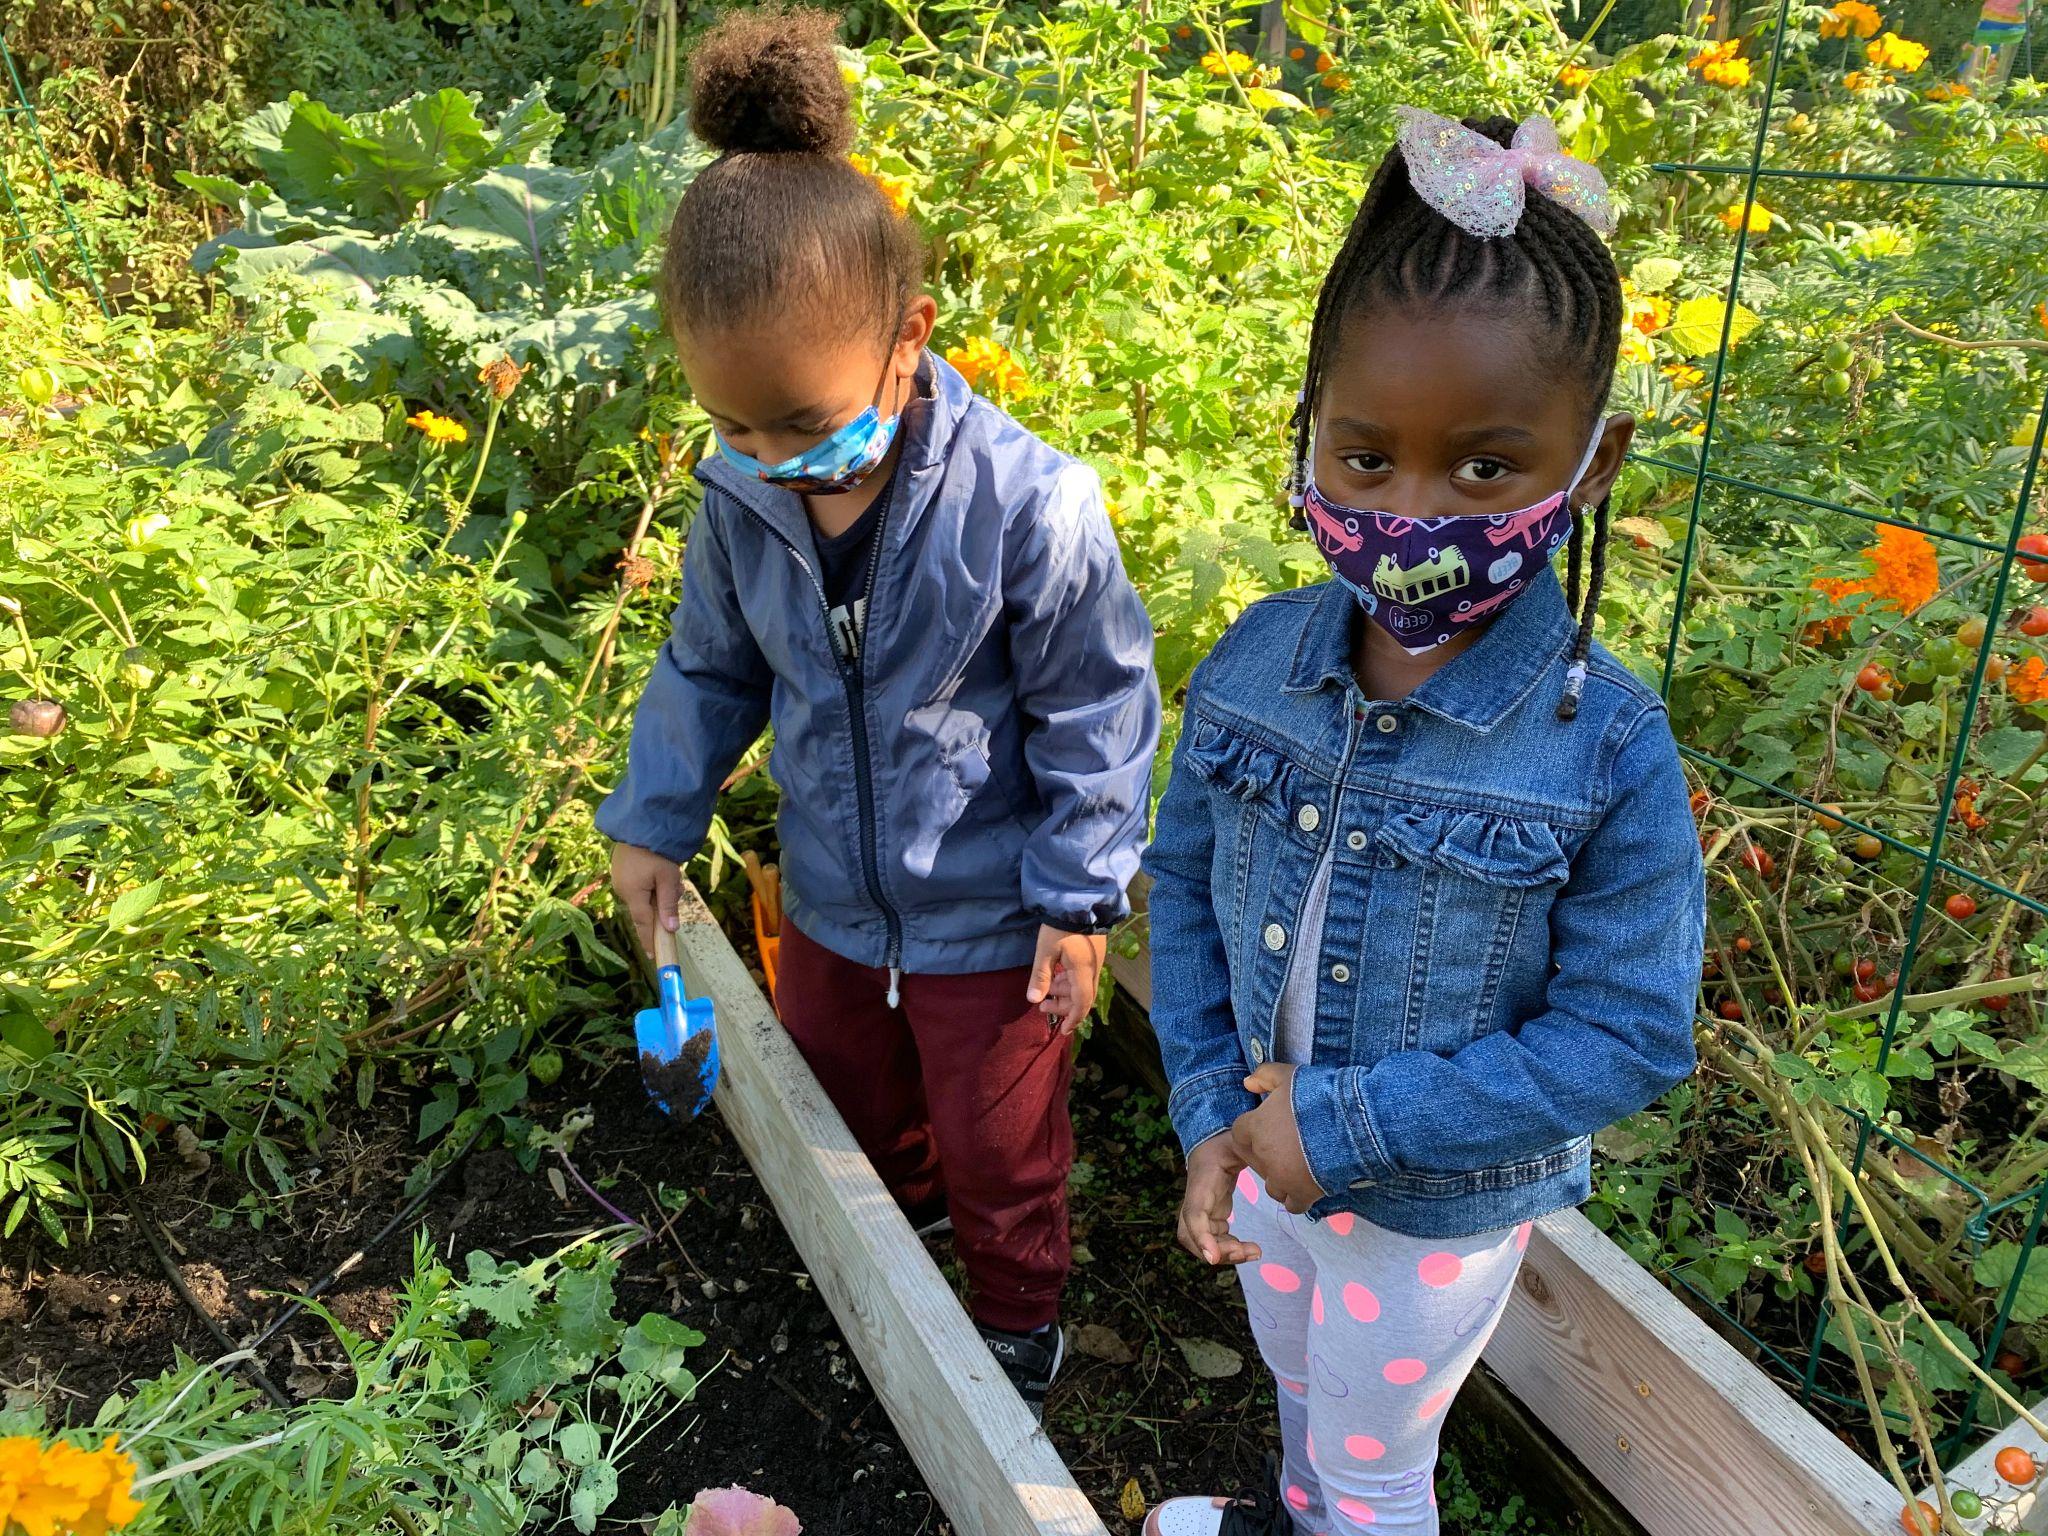 Early-Childhood-New York-Kingsbridge-Heights-2021 6.jpg